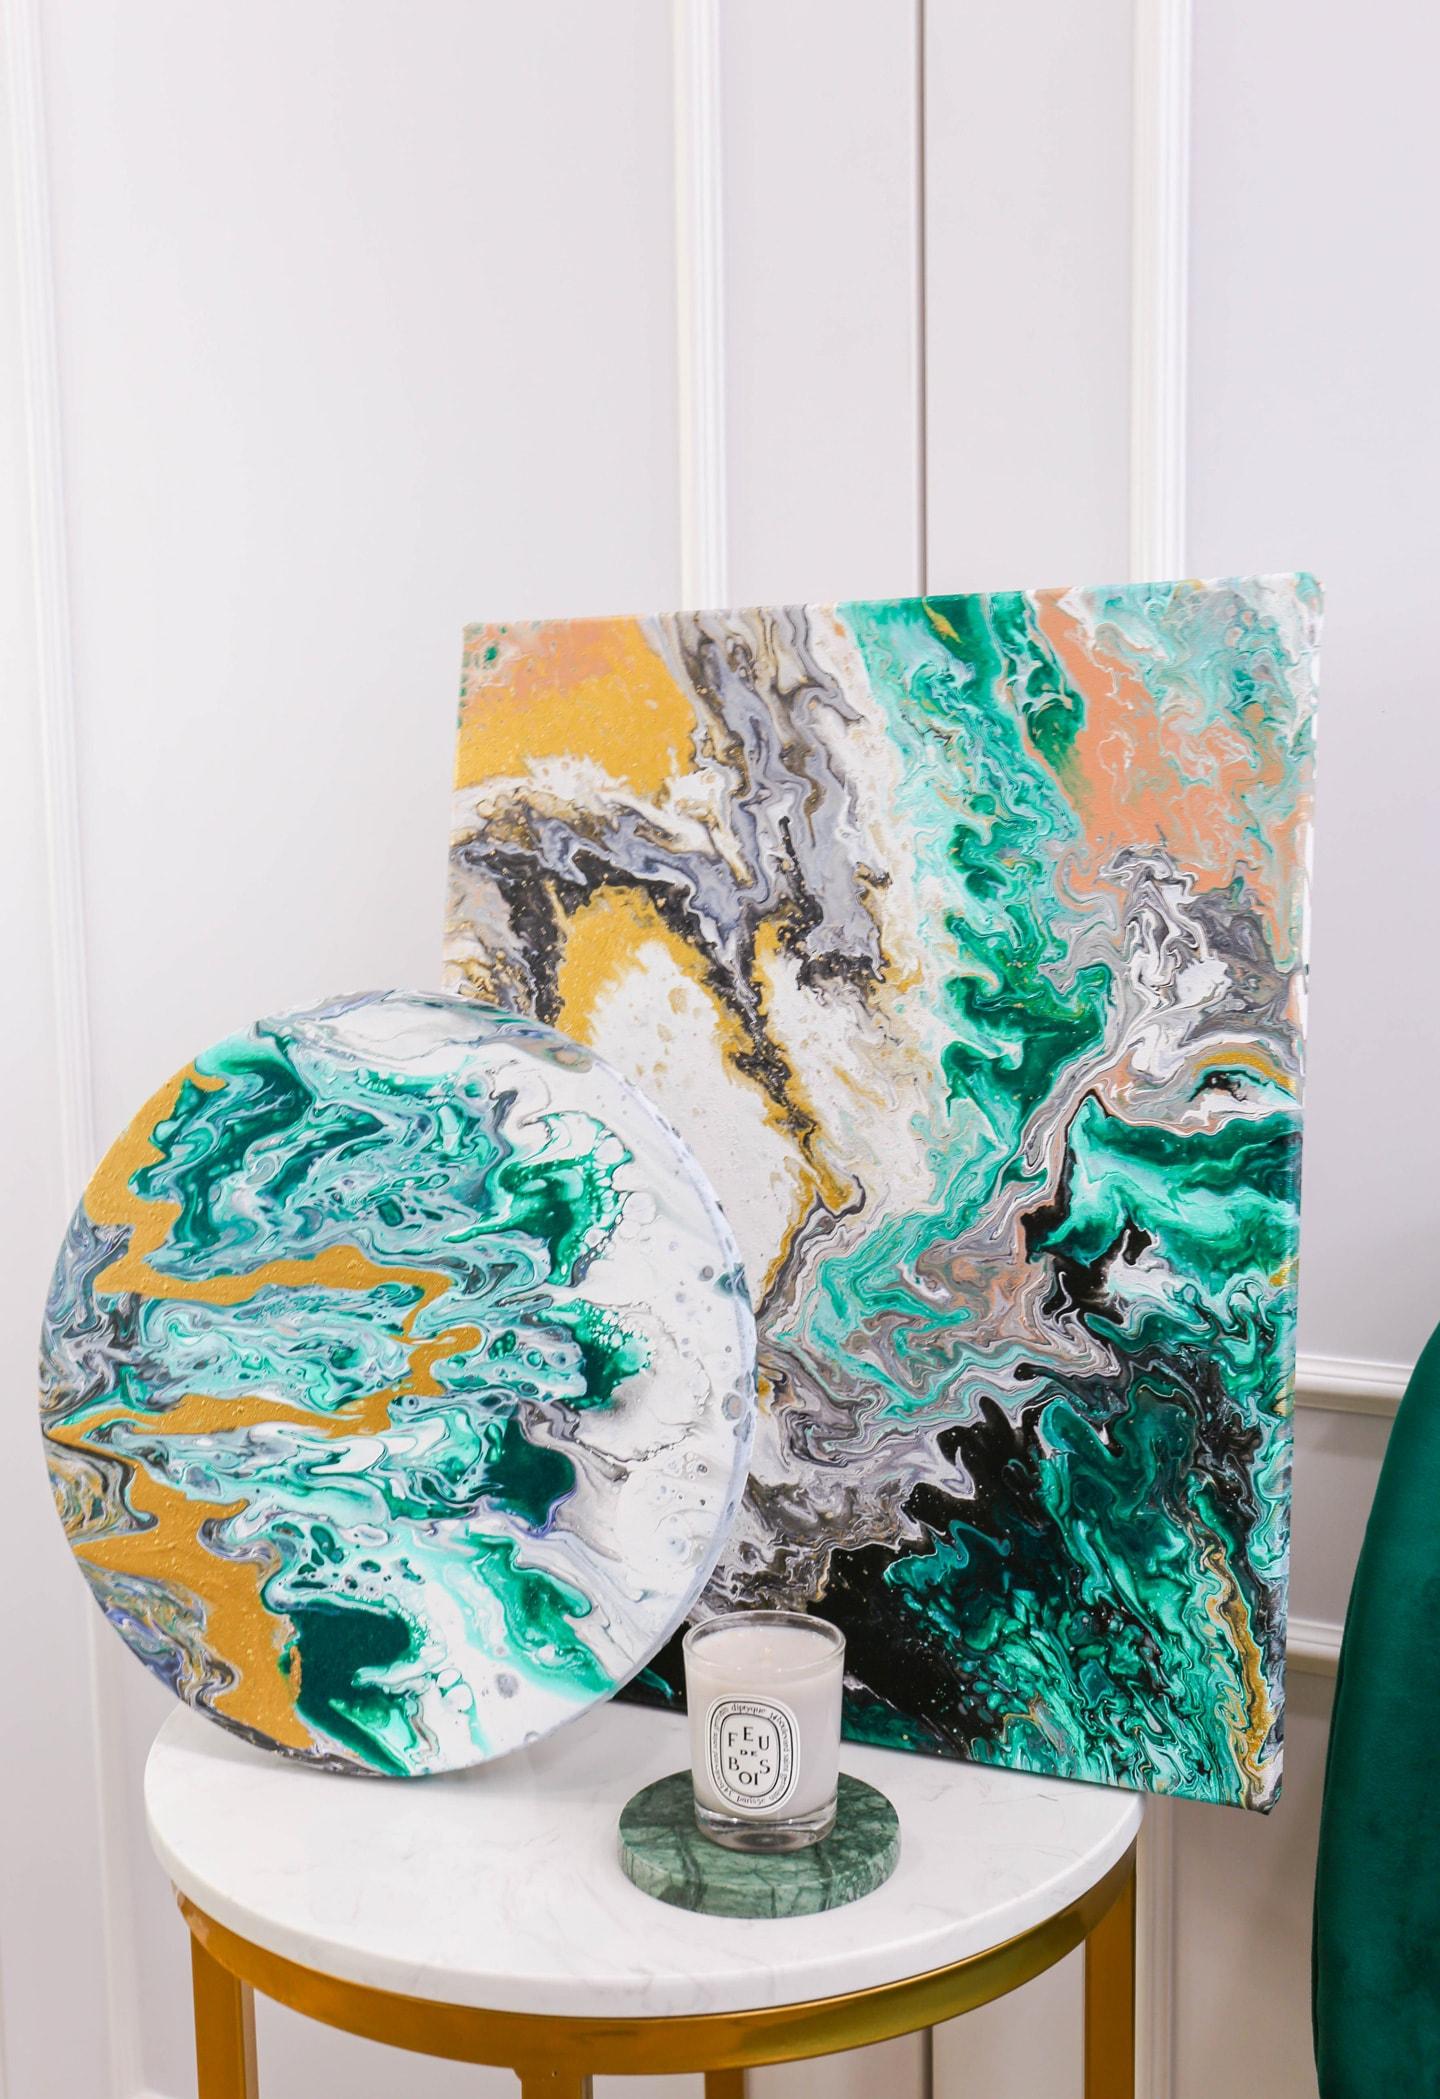 Carol Goh : Fluid Acrylic Paintings, Mera (Twopartsofone)